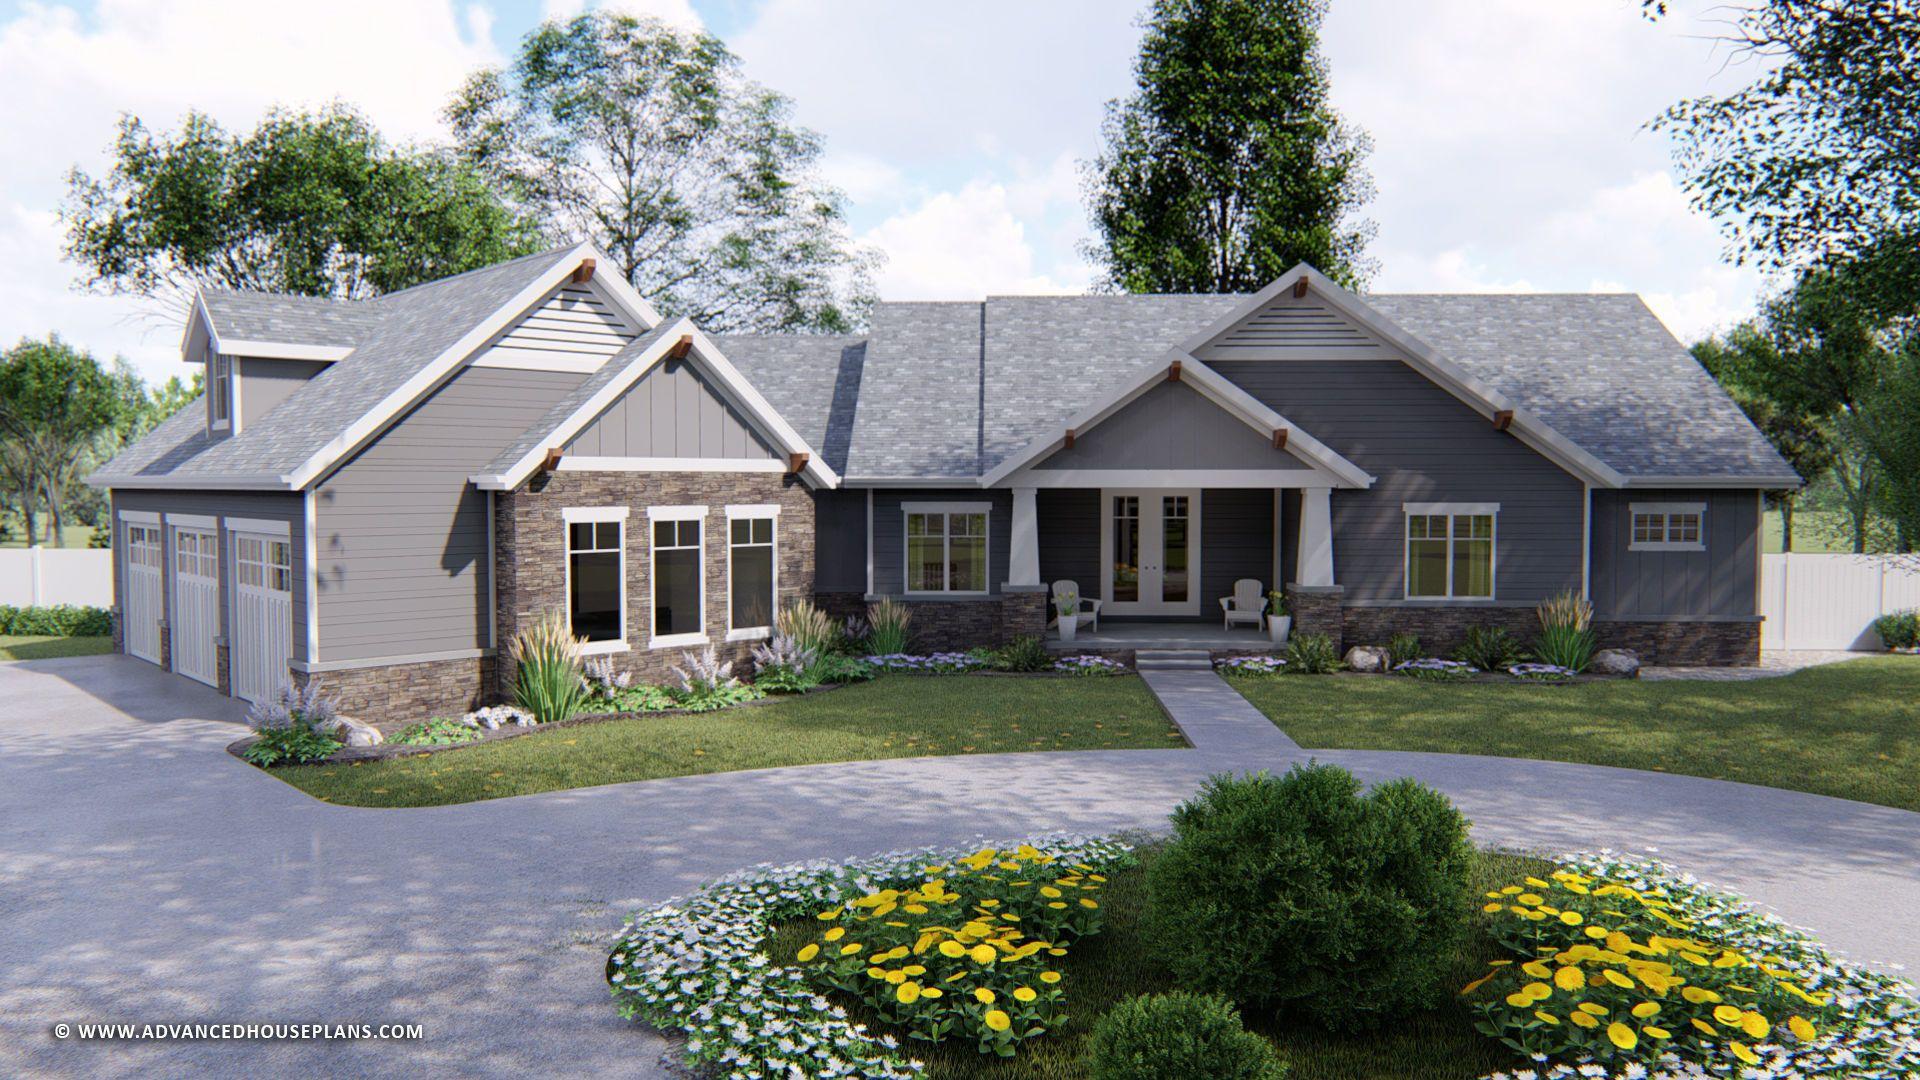 1 Story Craftsman House Plan Bridgetown Craftsman Style House Plans Craftsman House Craftsman House Plans